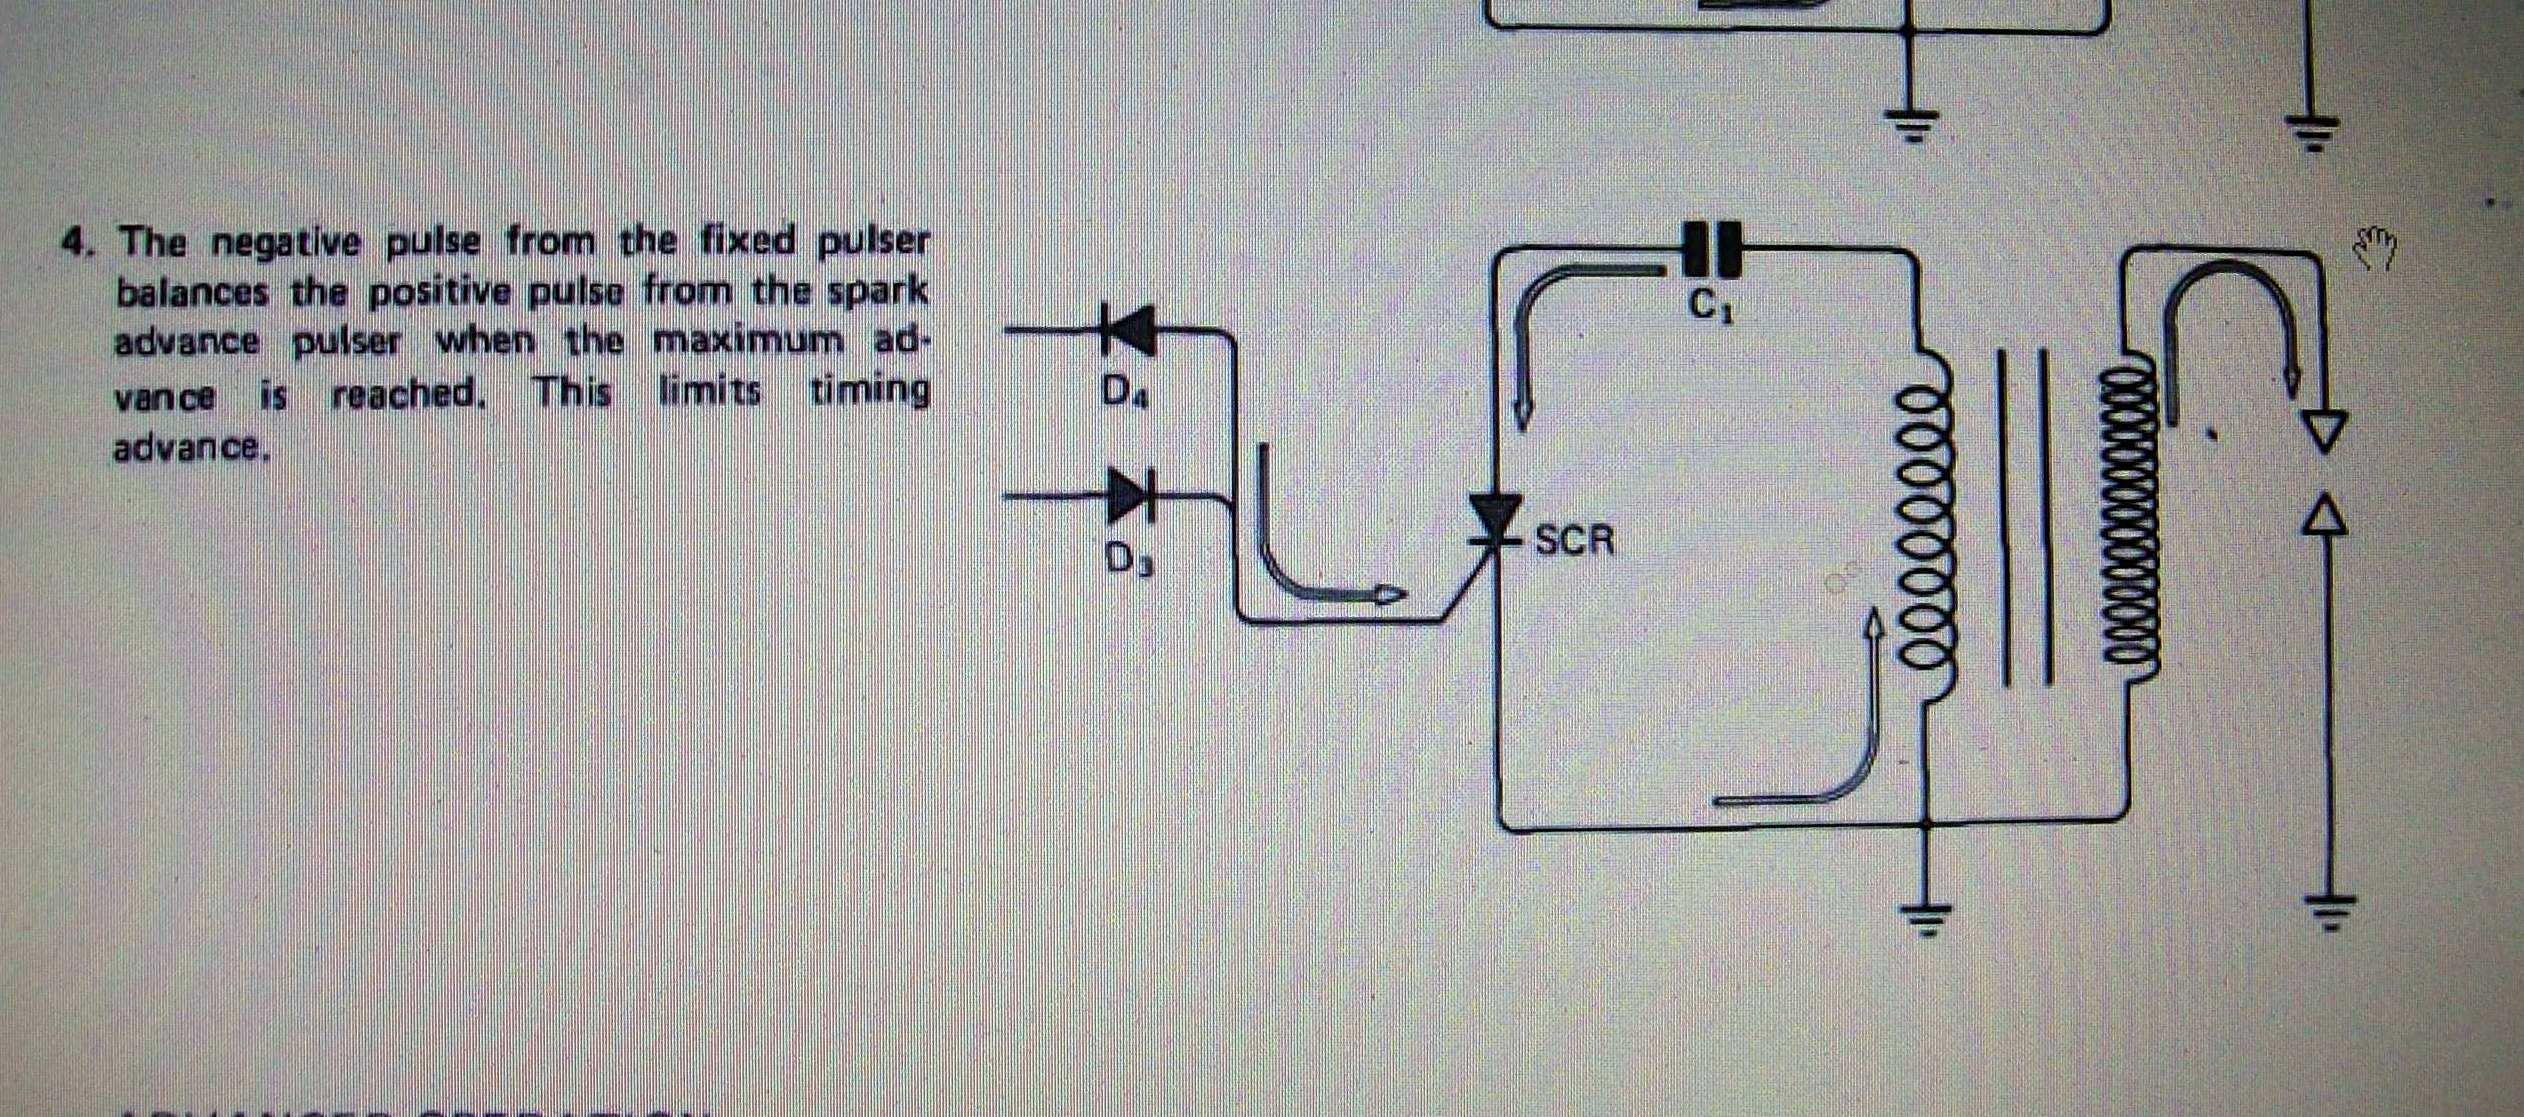 cdi wiring help please - cb400t on